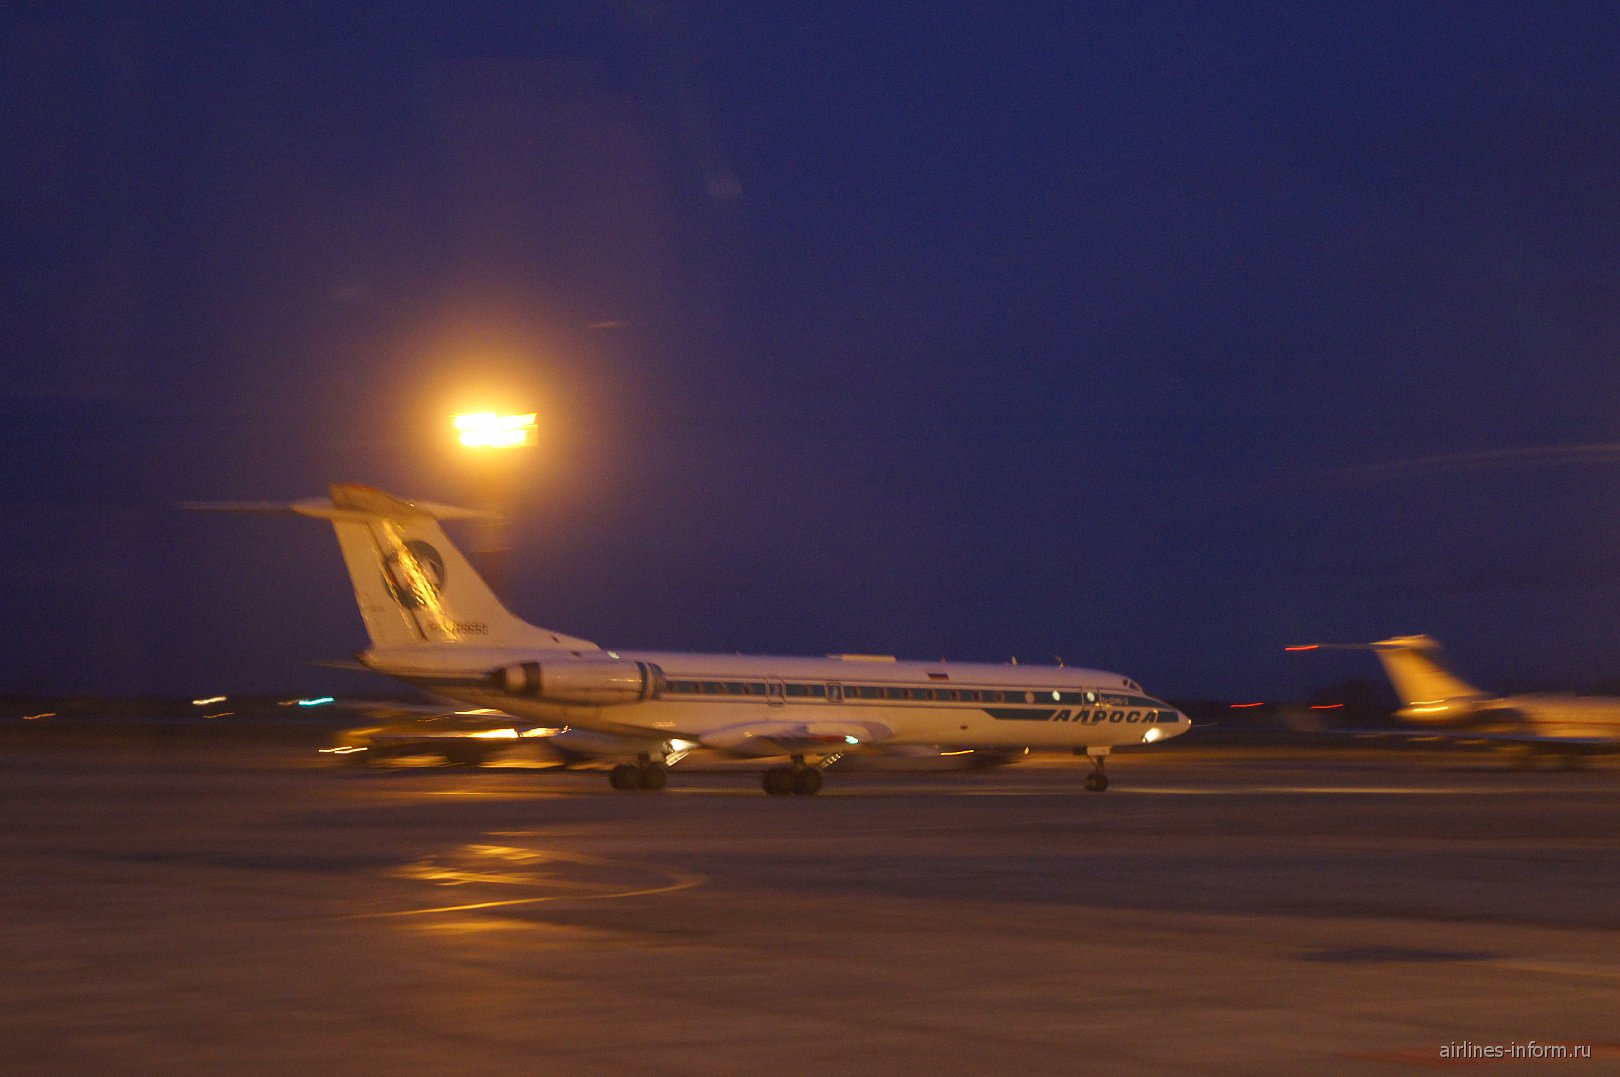 Ту-134 авиакомпании Алроса